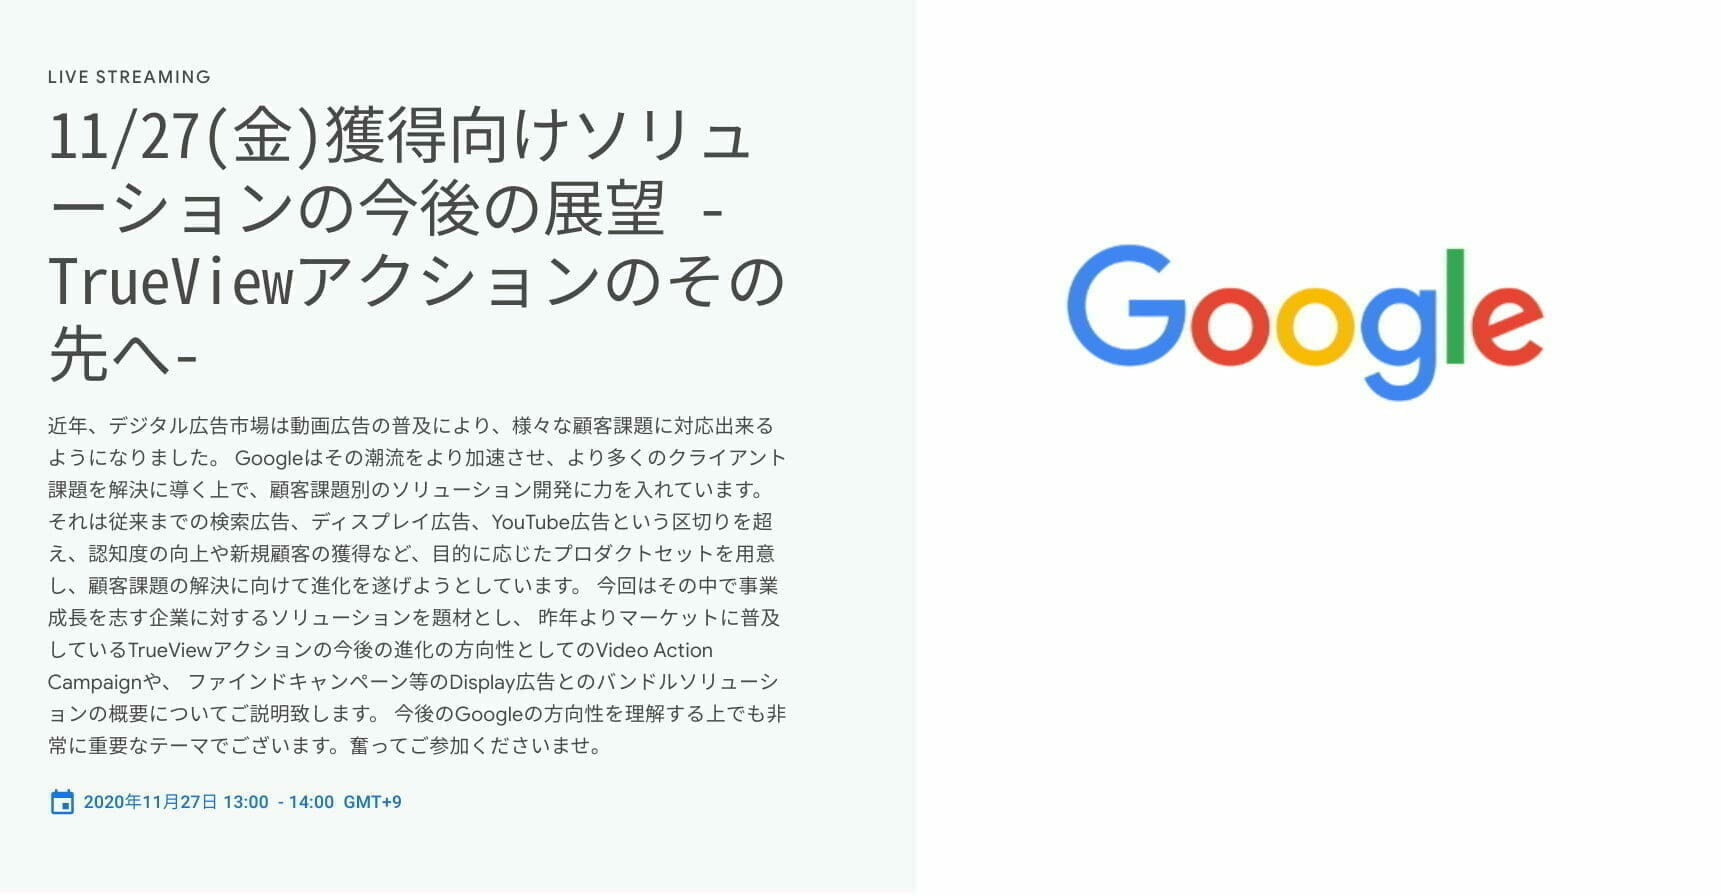 [Google 広告] ウェブマーケティングの基本とGoogle広告の活用方法